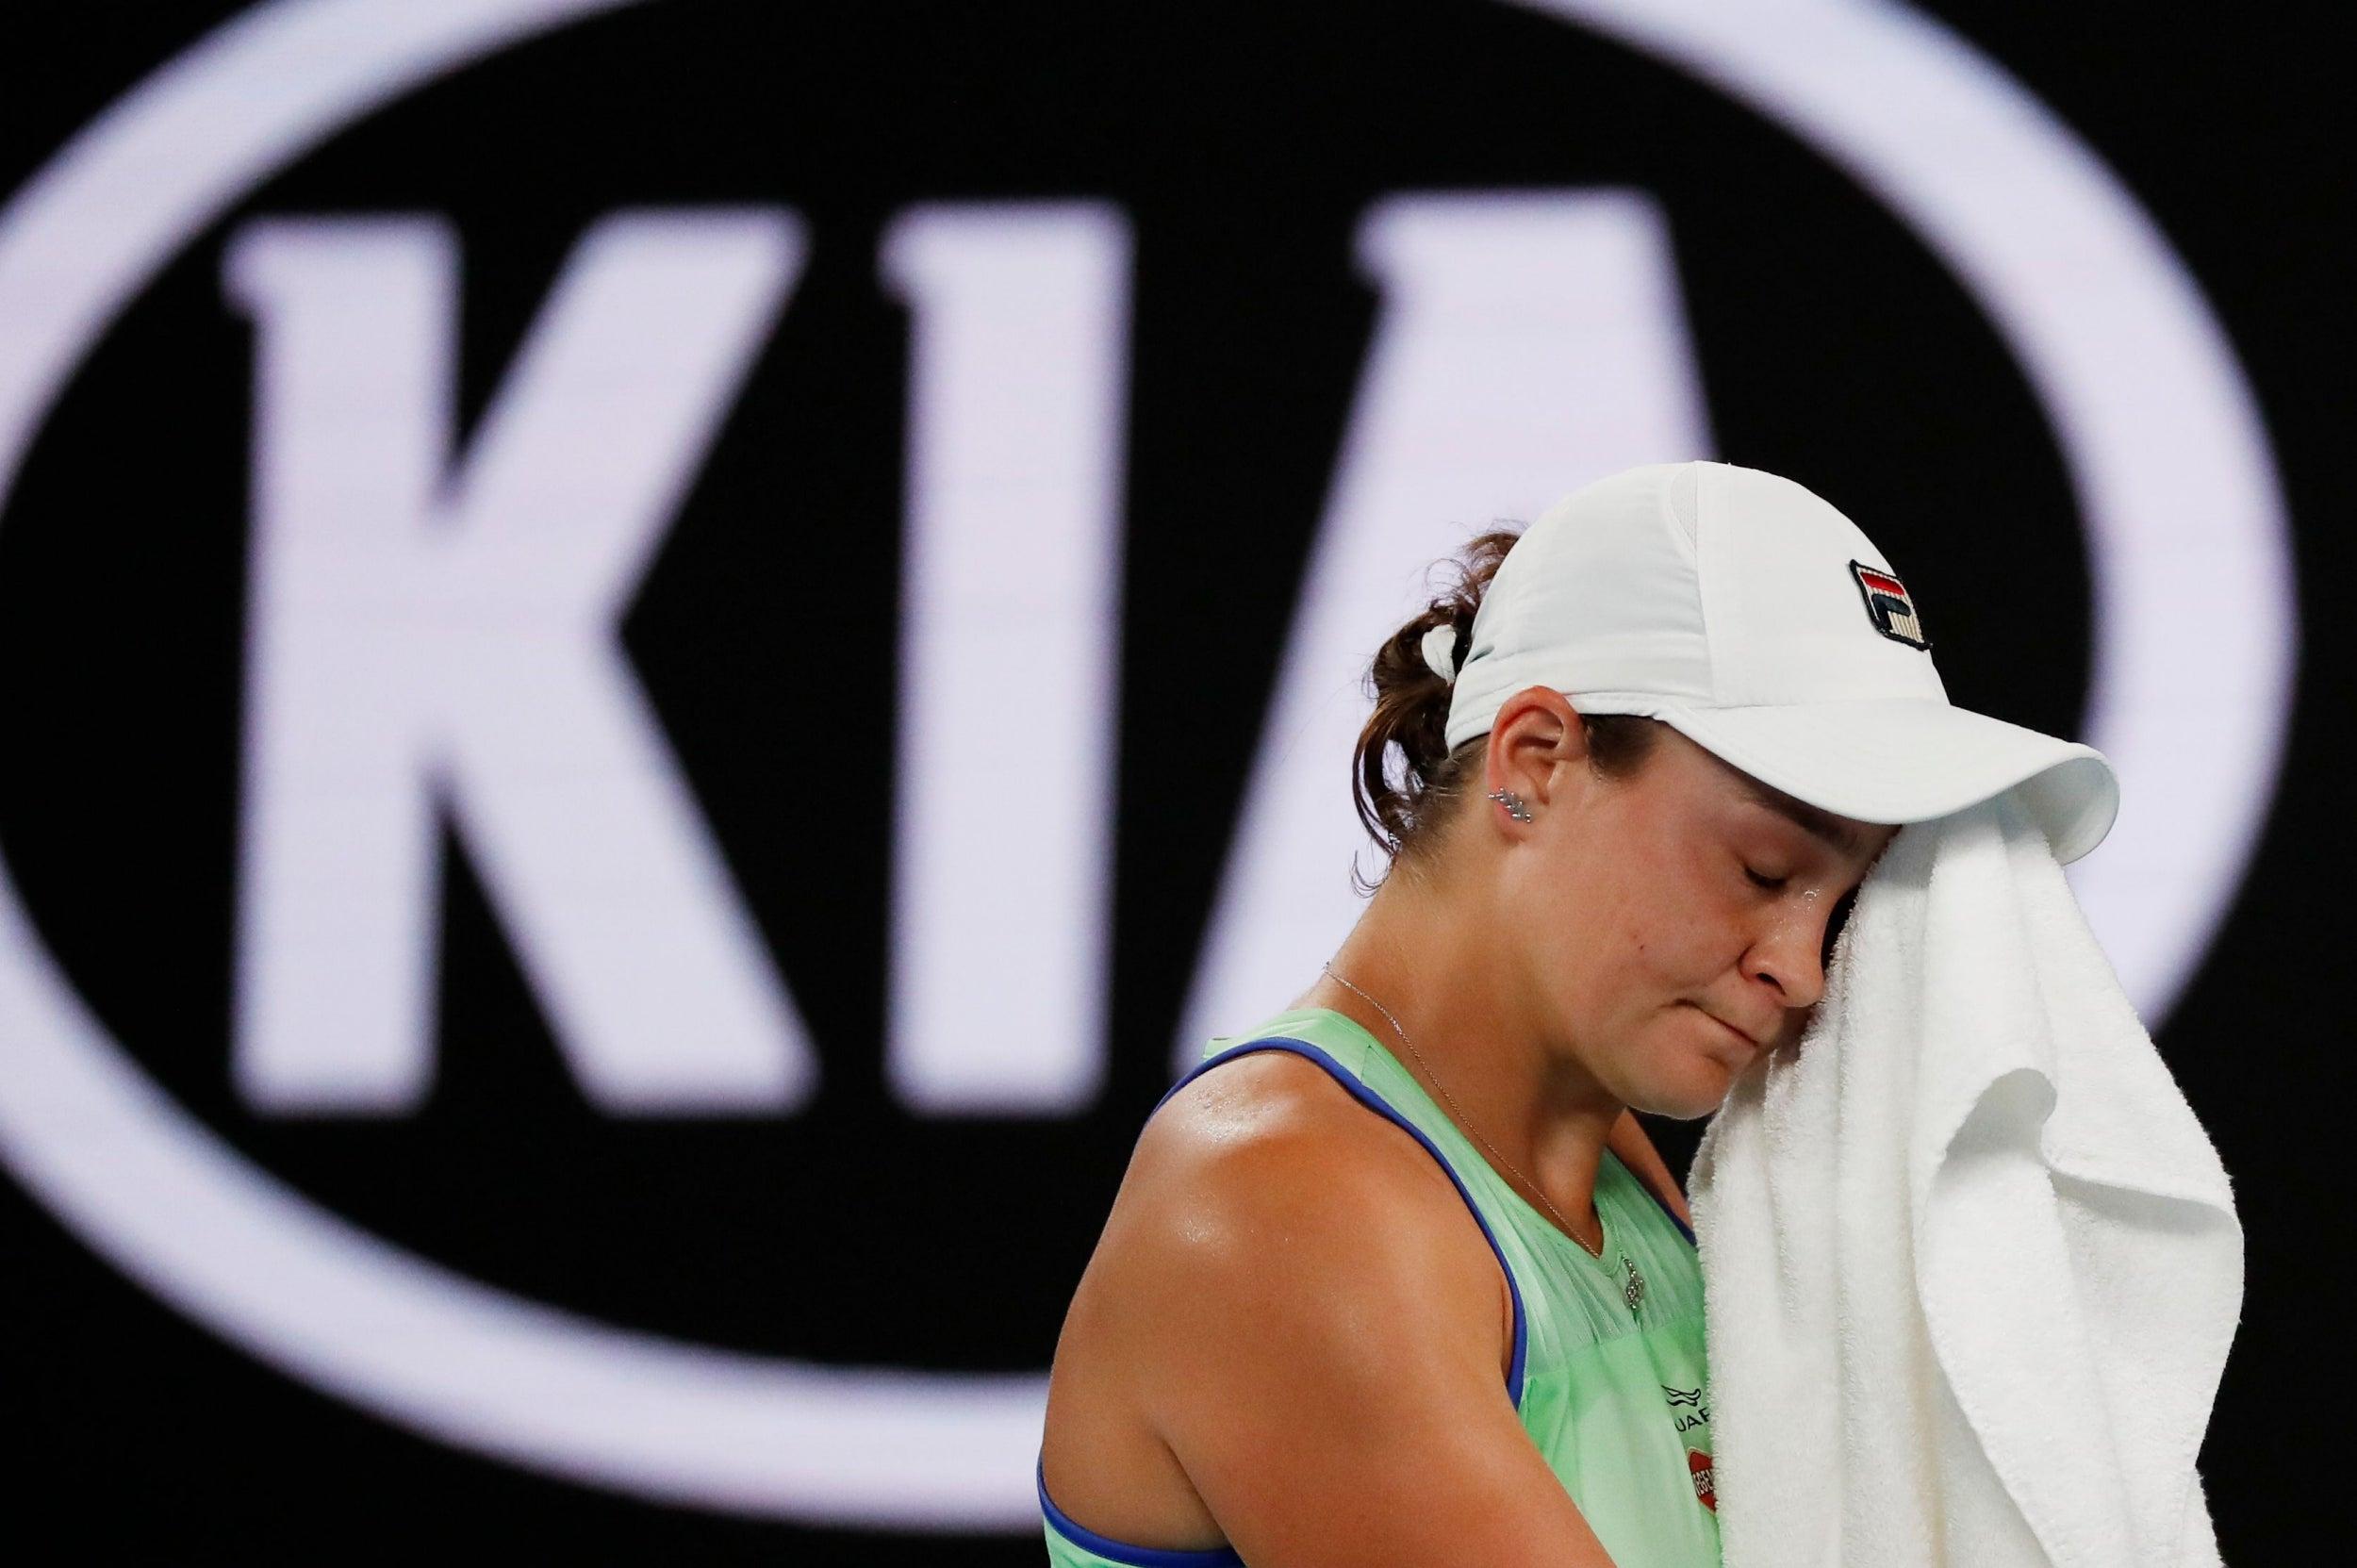 Australian Open 2020 Novak Djokovic Stutters But Progresses